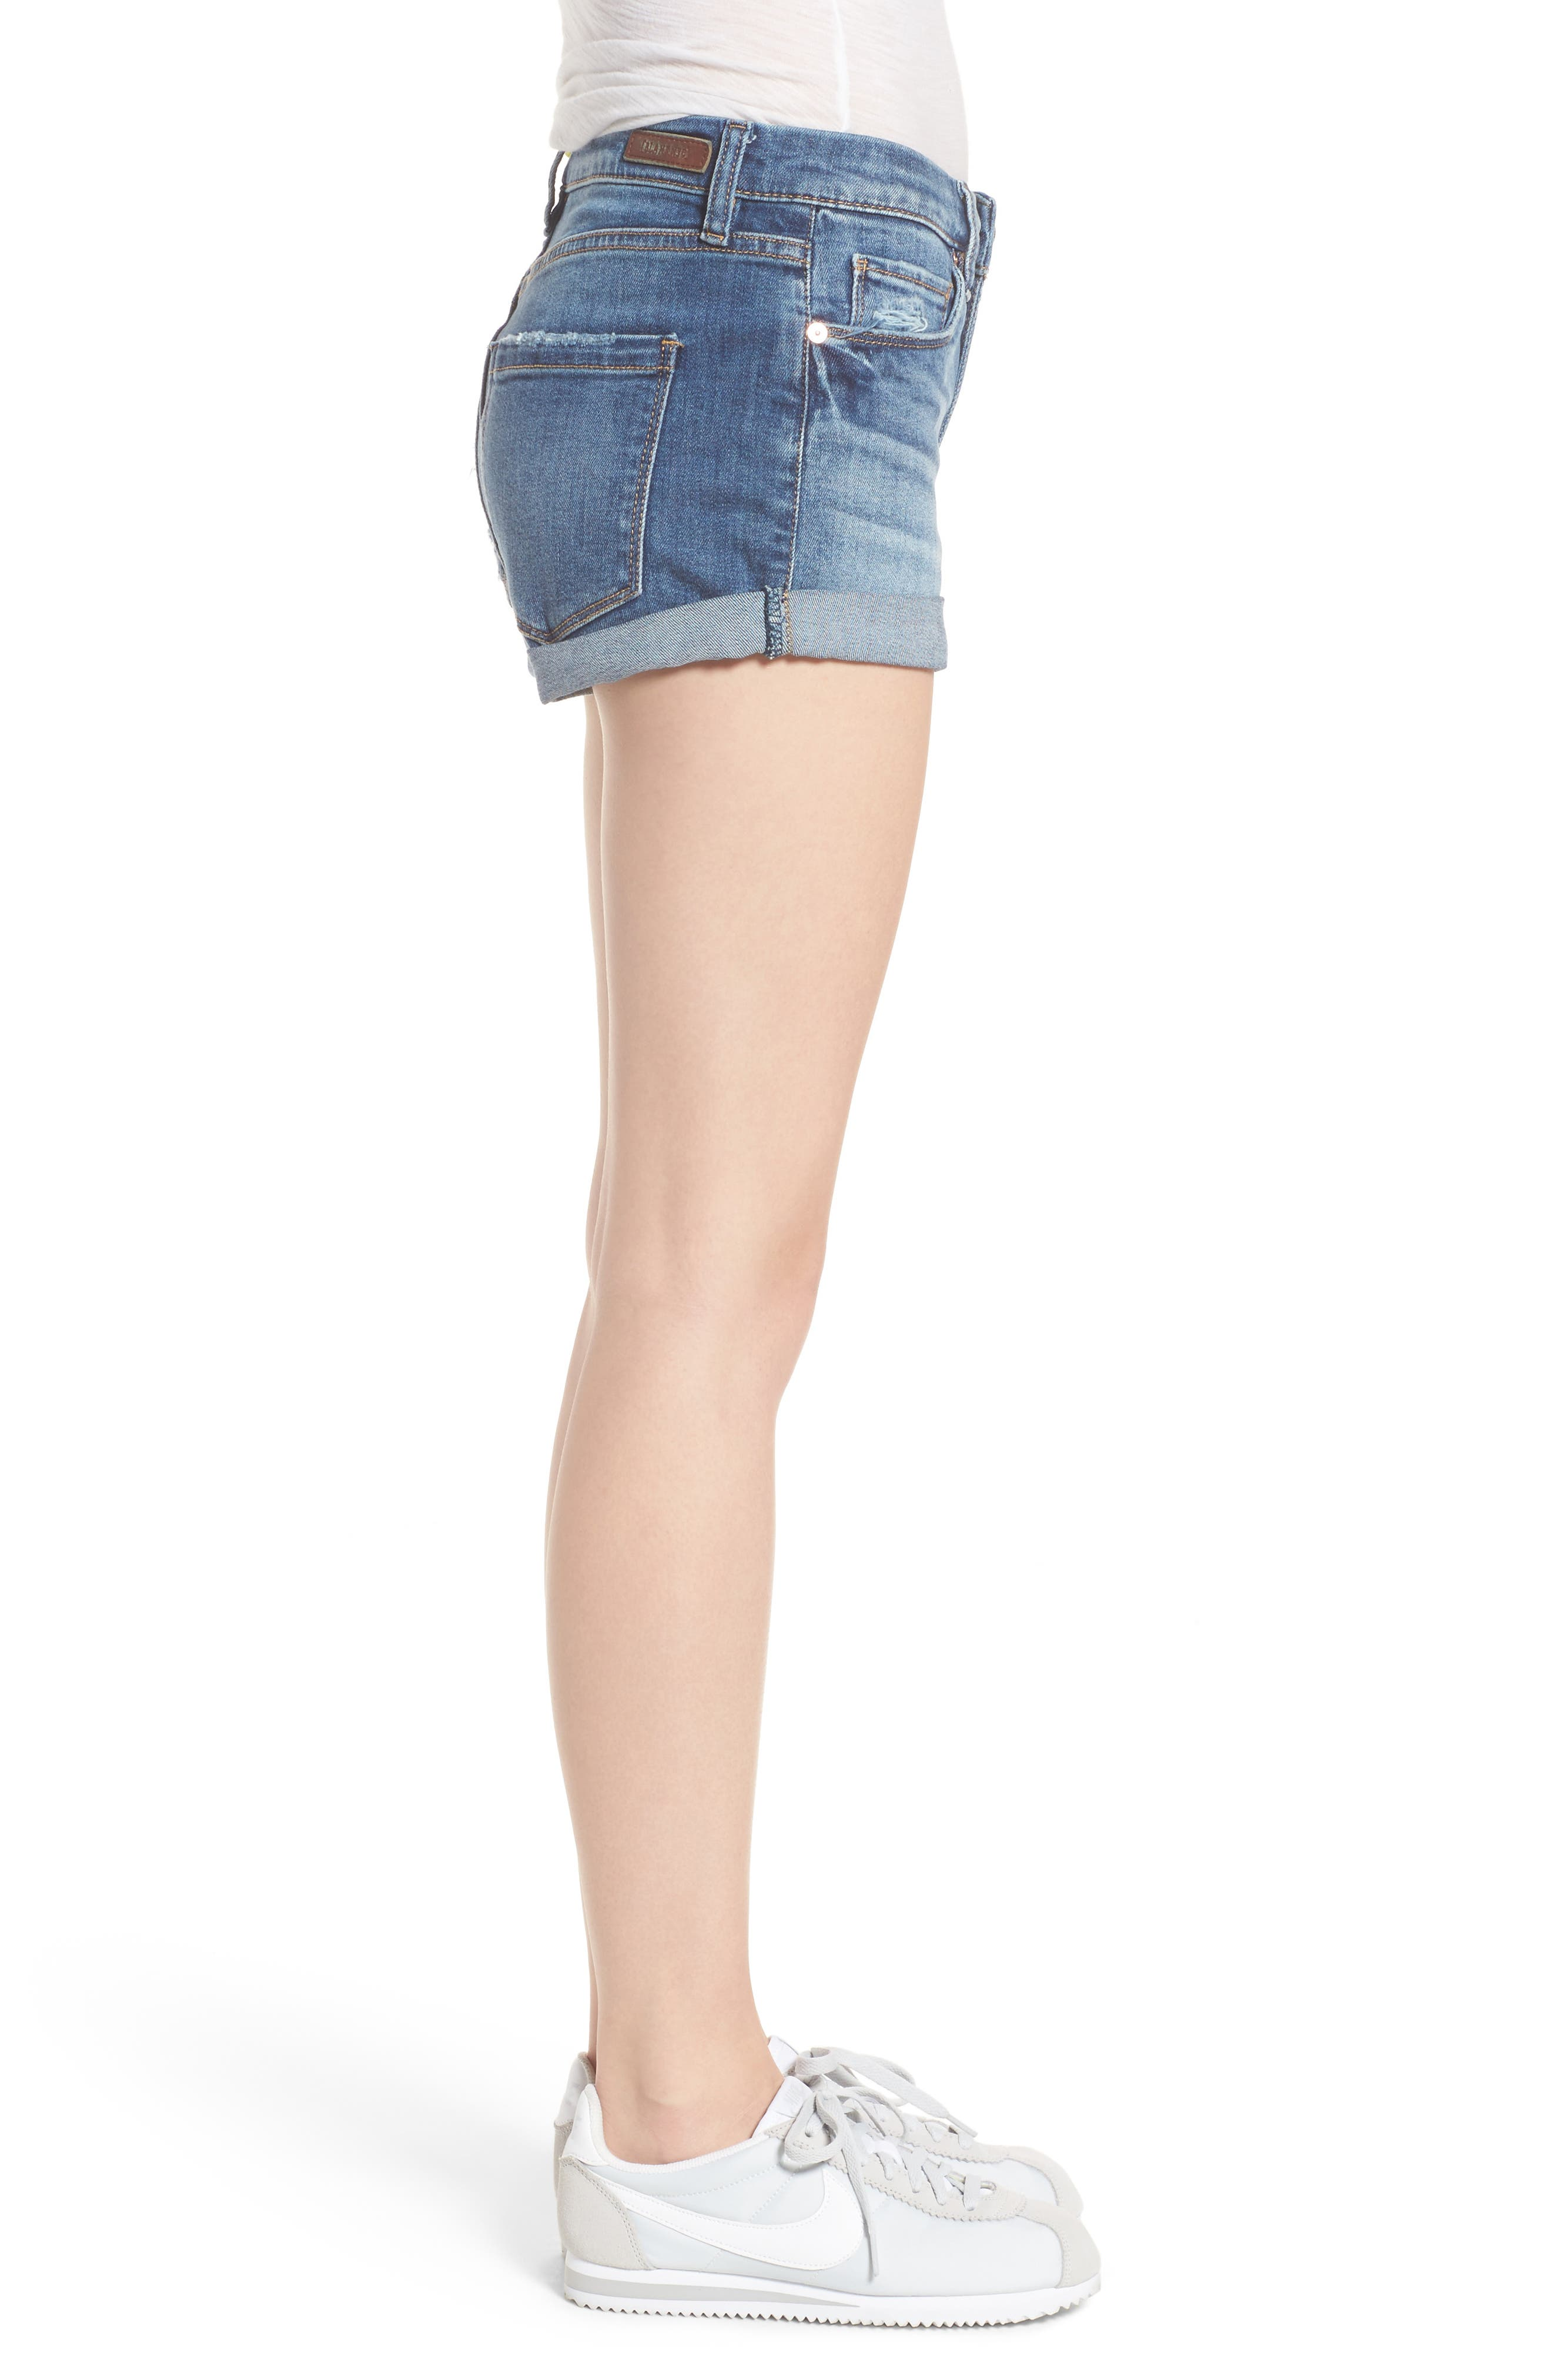 Plalay Hard Cuffed Jean Shorts,                             Alternate thumbnail 3, color,                             Blue